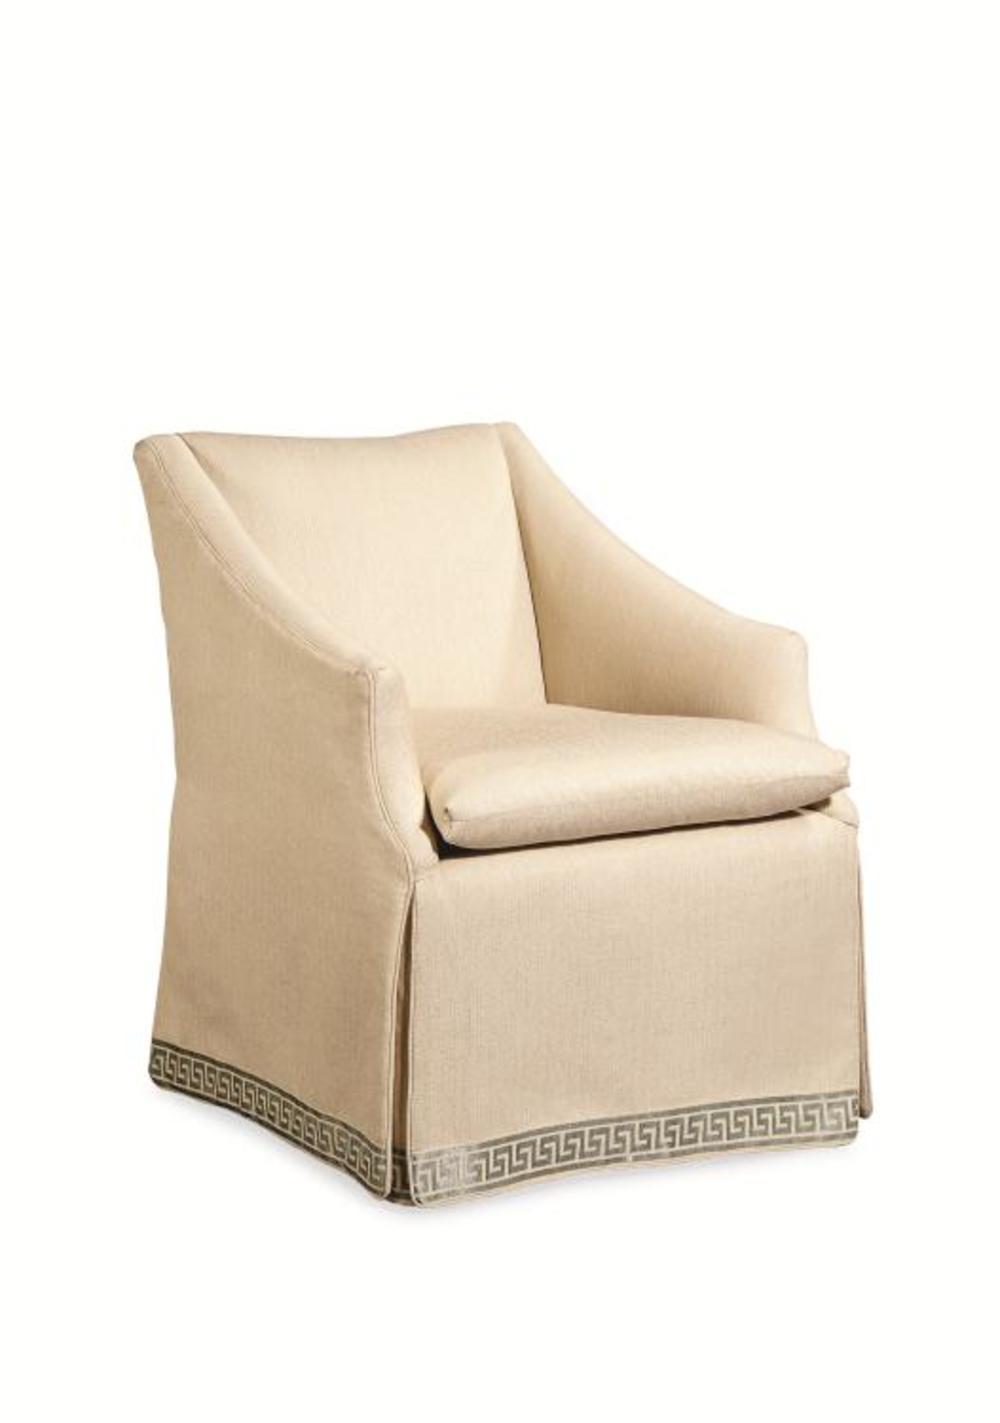 Century Furniture - Coloney Swivel Chair